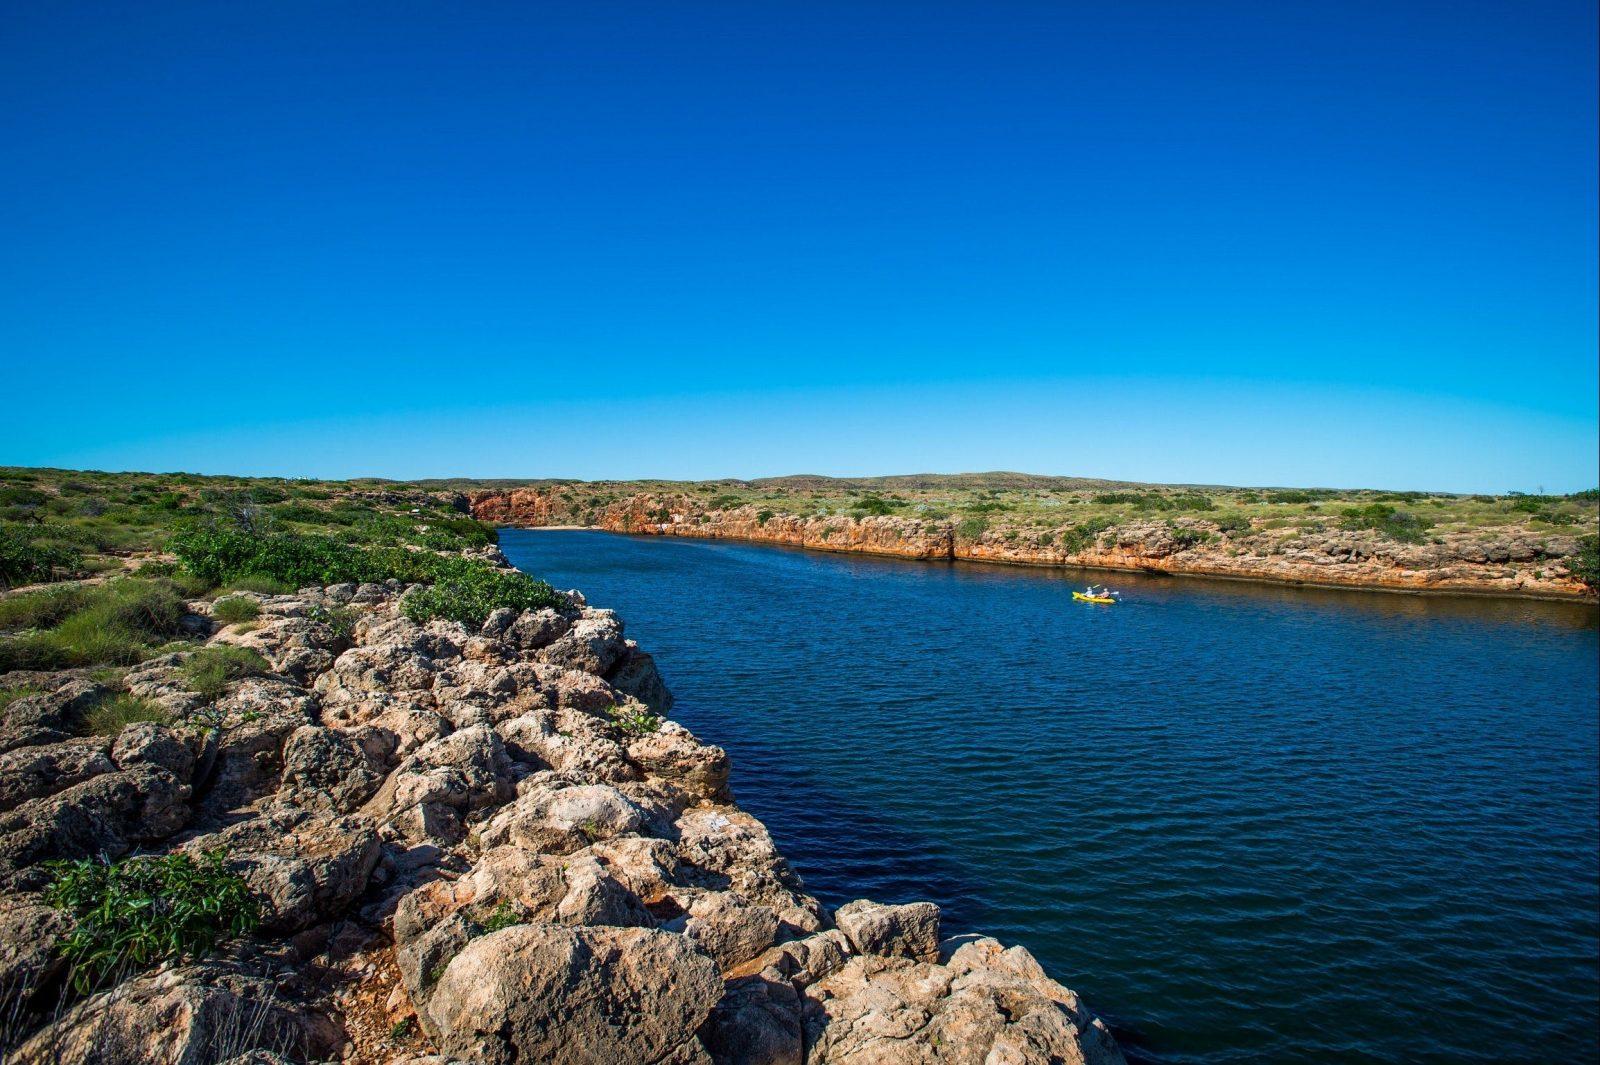 Yardie Creek, Cape Range National Park, Exmouth, Western Australia